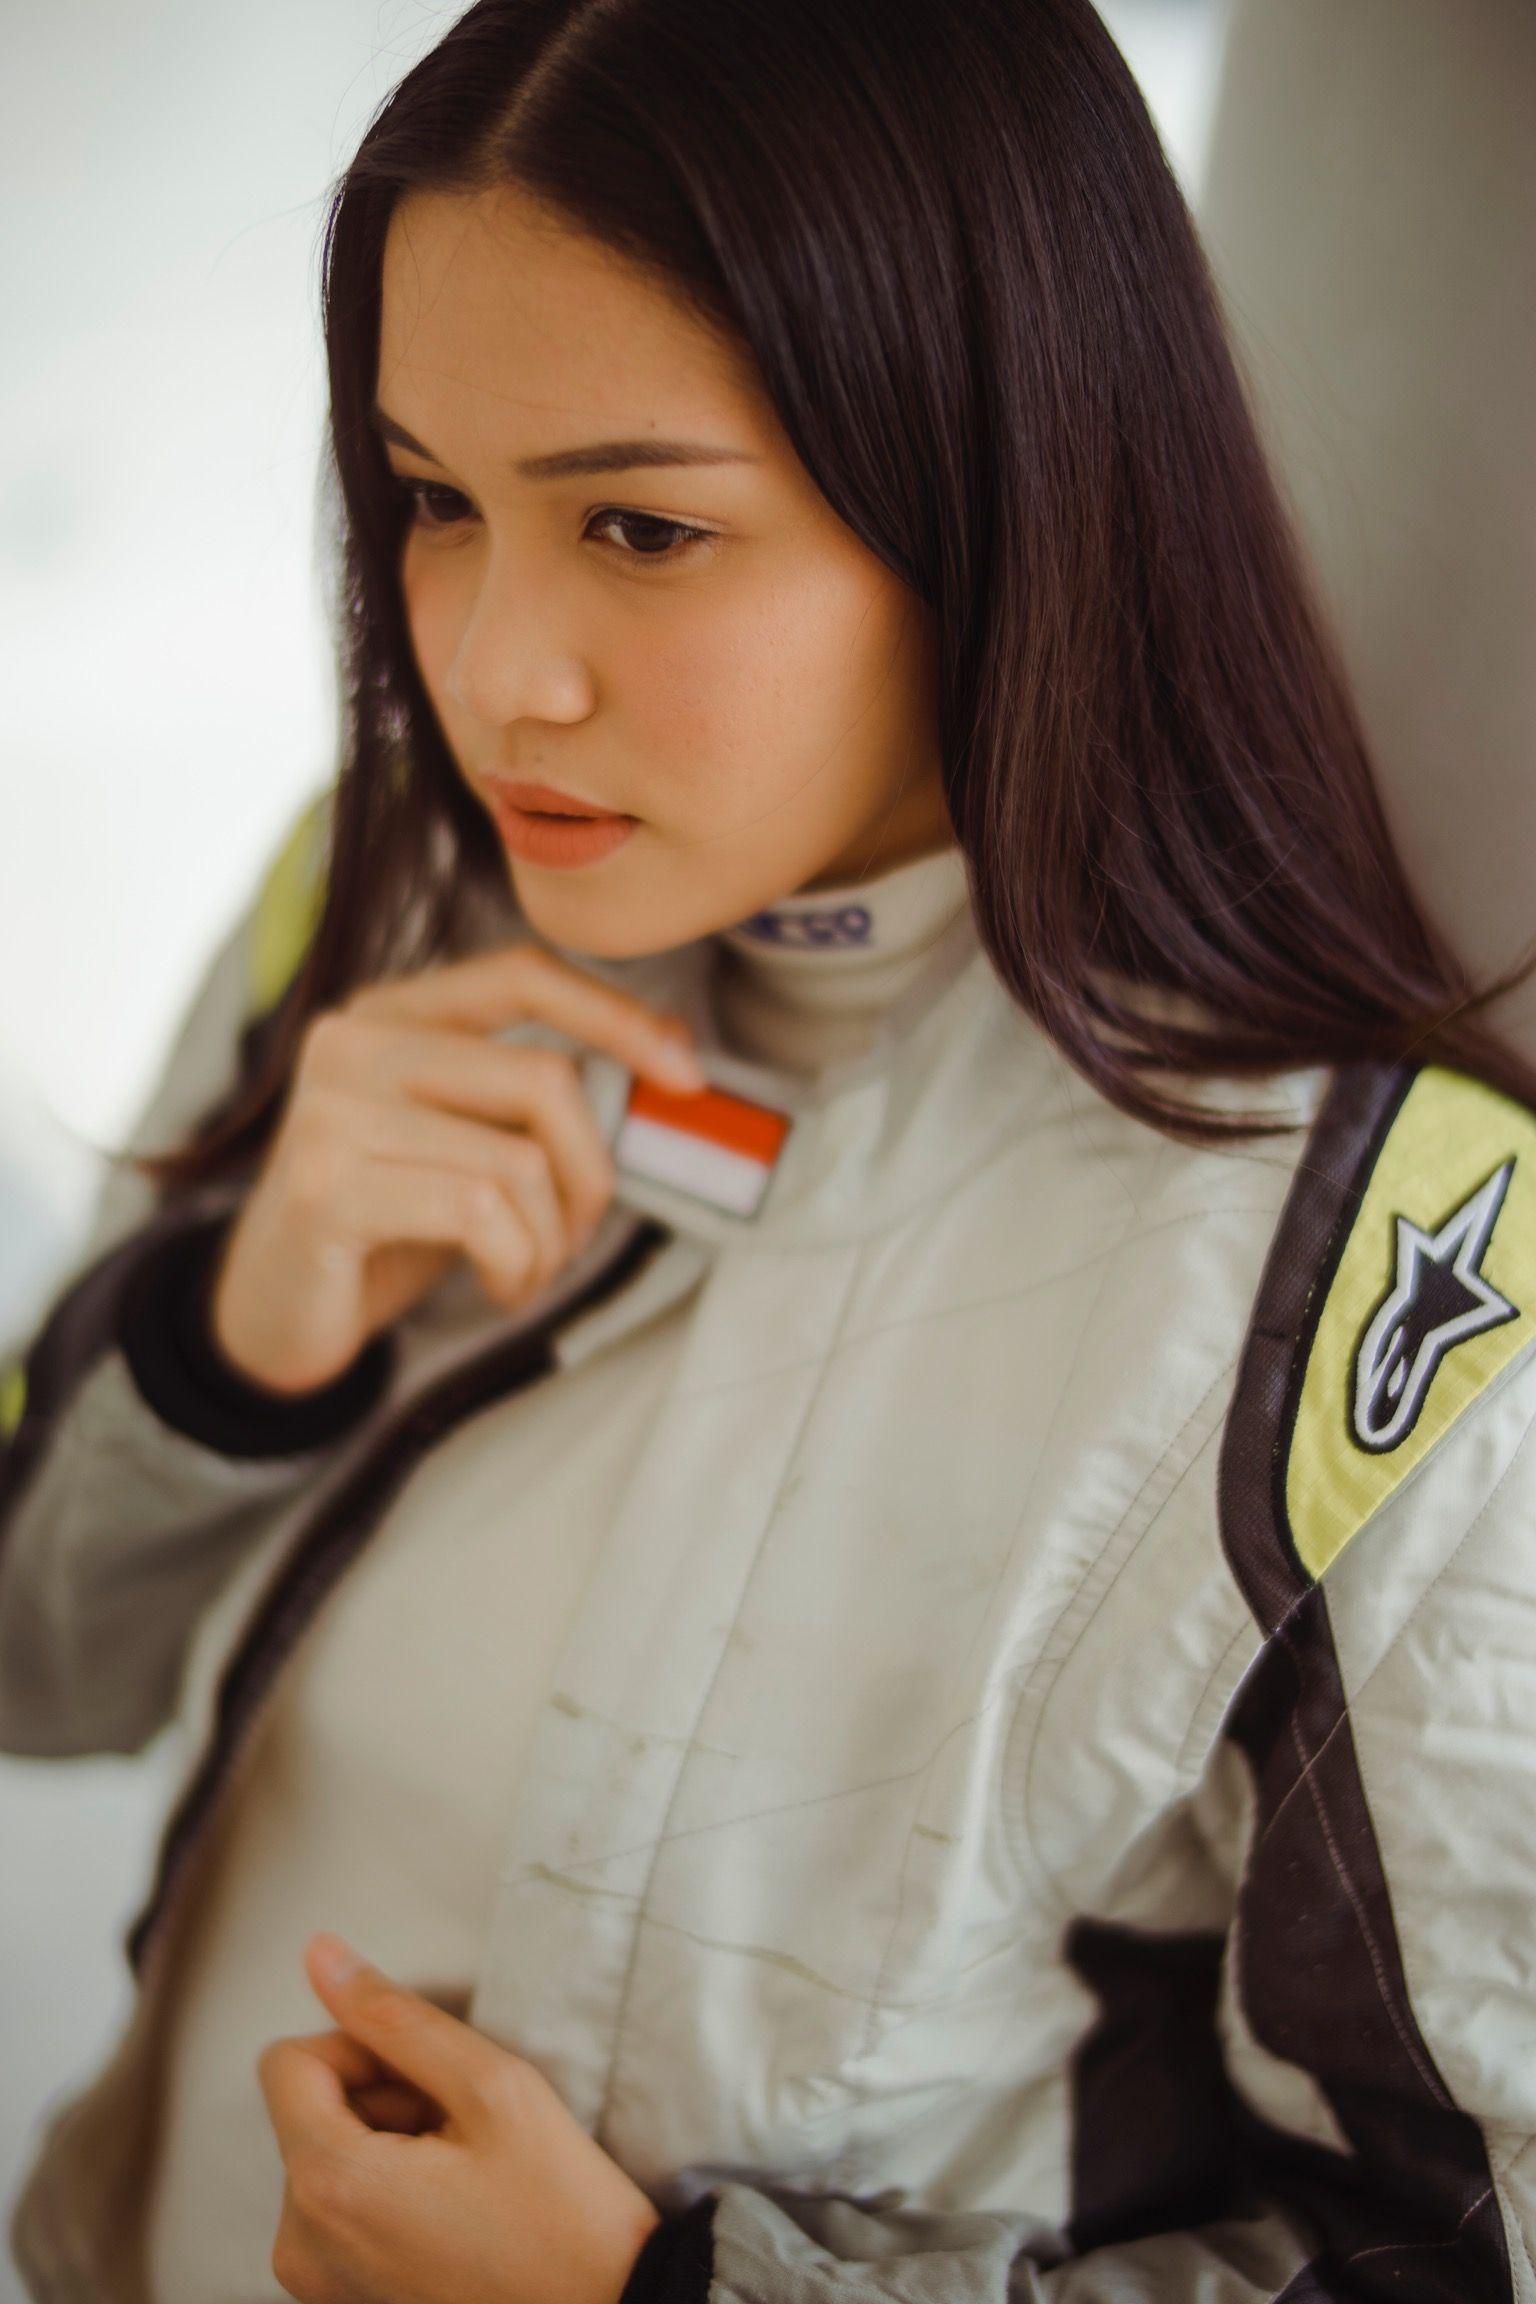 #IAmReal: Alexandra Asmasoebrata, Karier Diluar Olahraga dan Sikap Anti-idealis